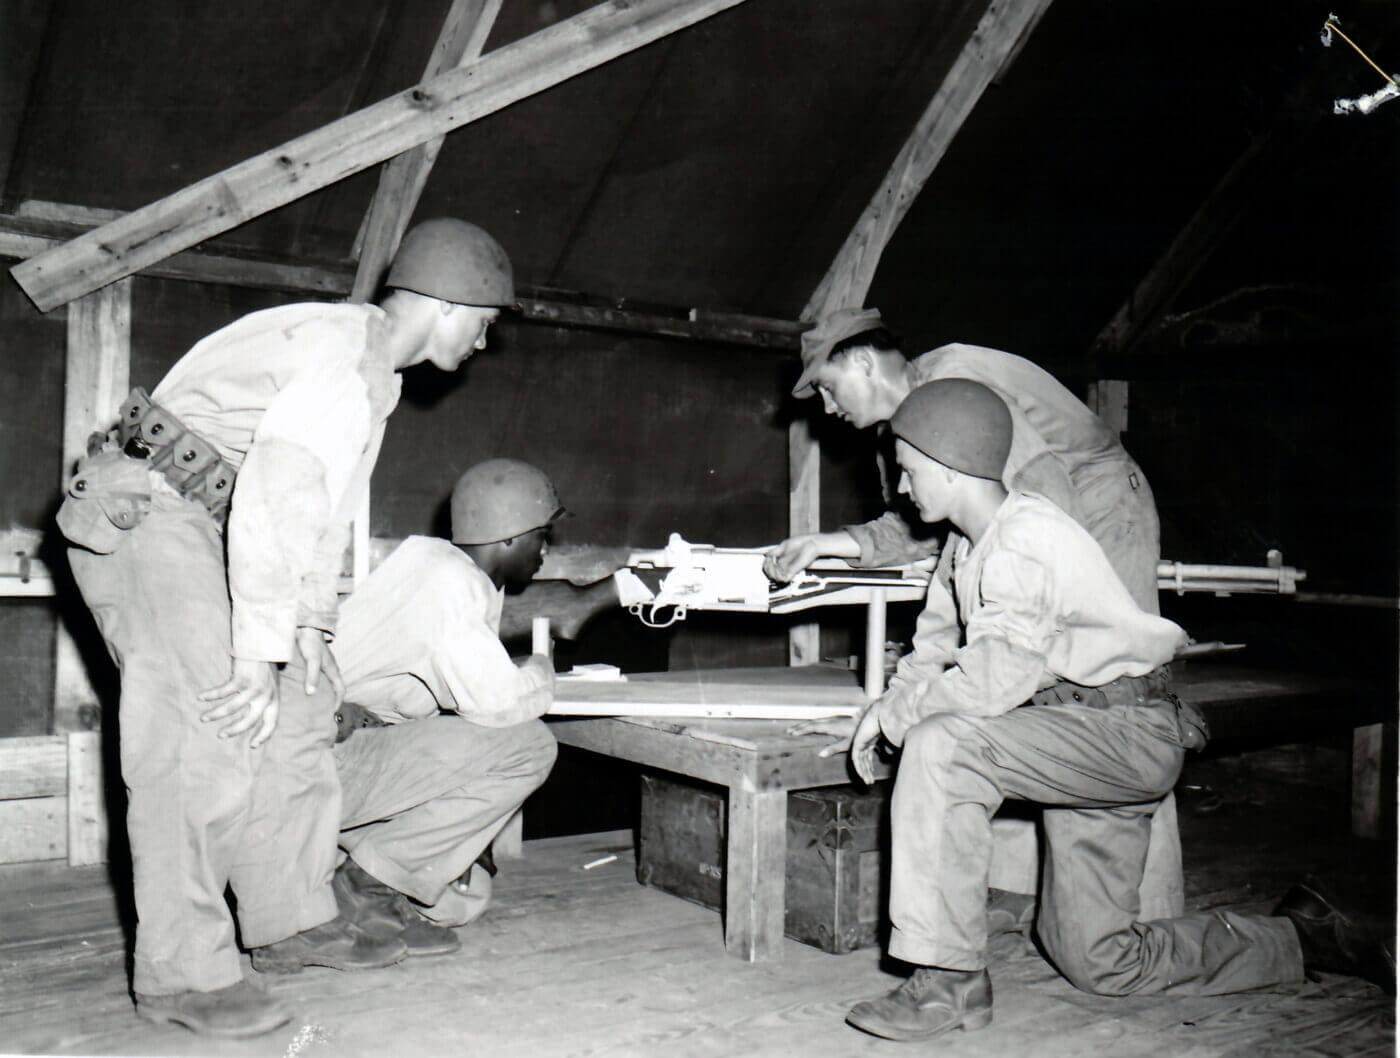 M1 training tool at Parris Island 1952